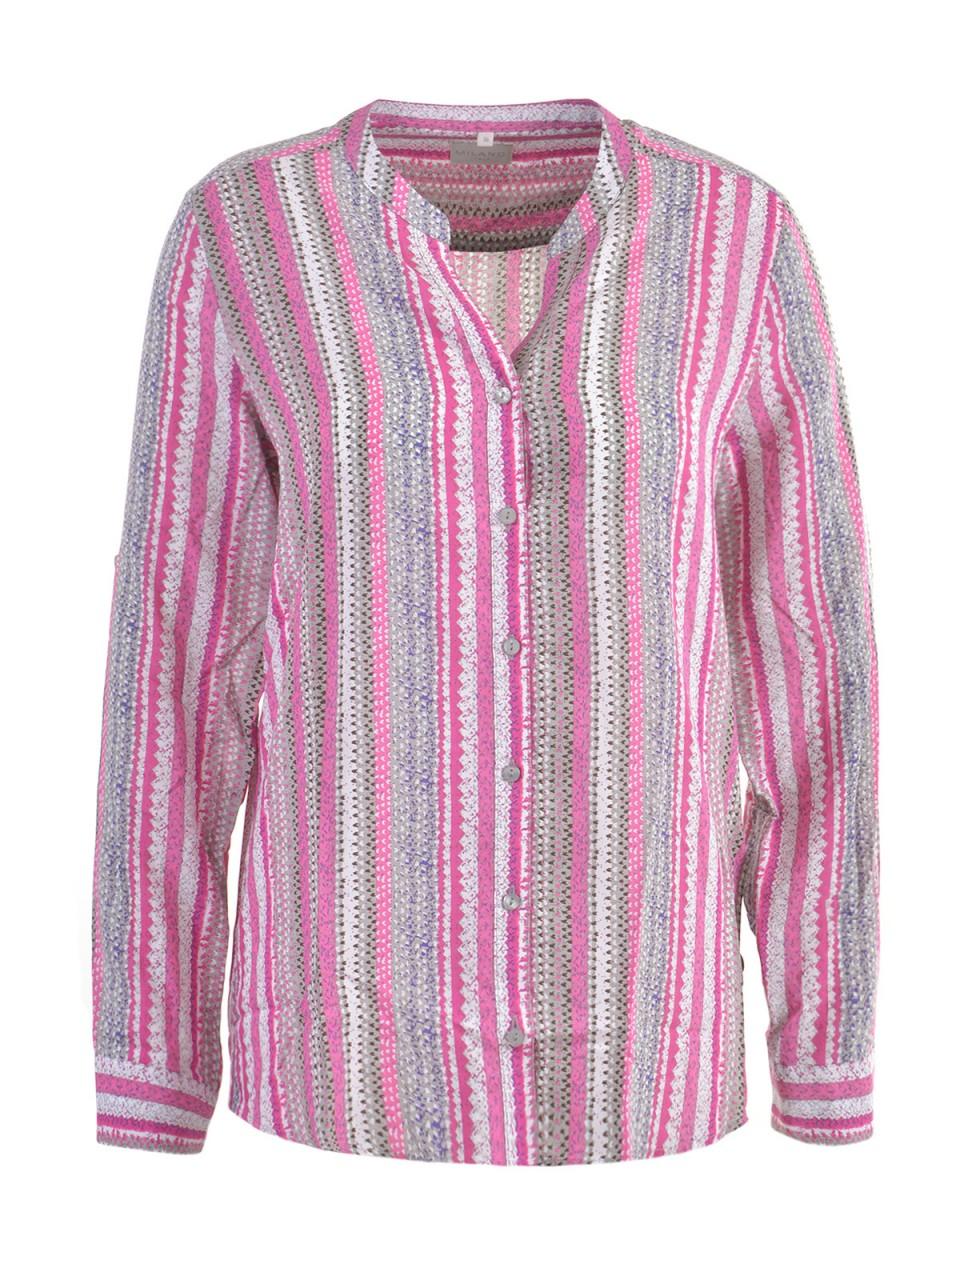 milano-italy-damen-bluse-pink-grau